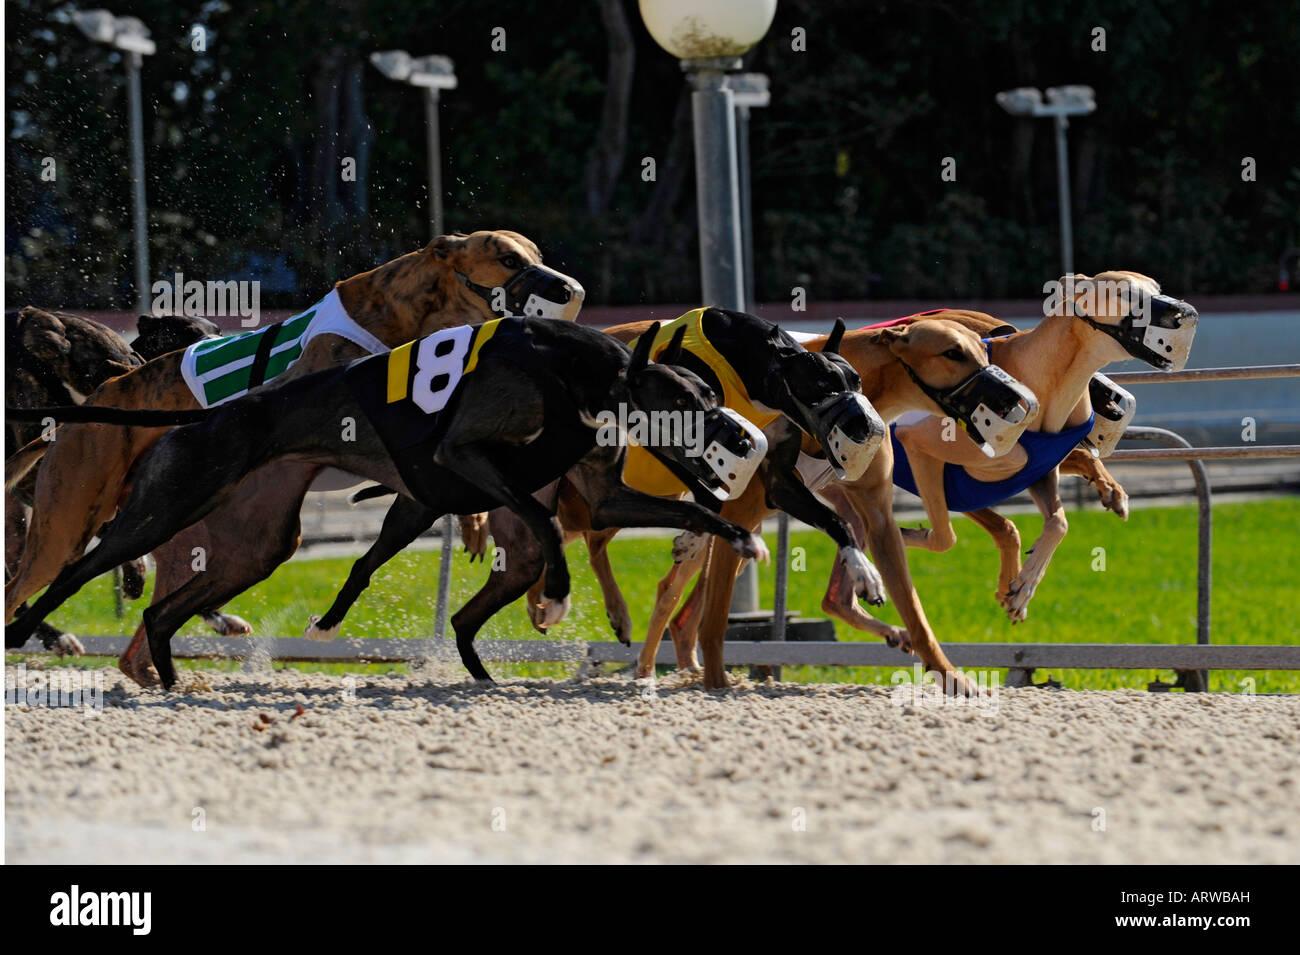 Greyhound dog racing at Fort Myers Naples dog track Florida - Stock Image